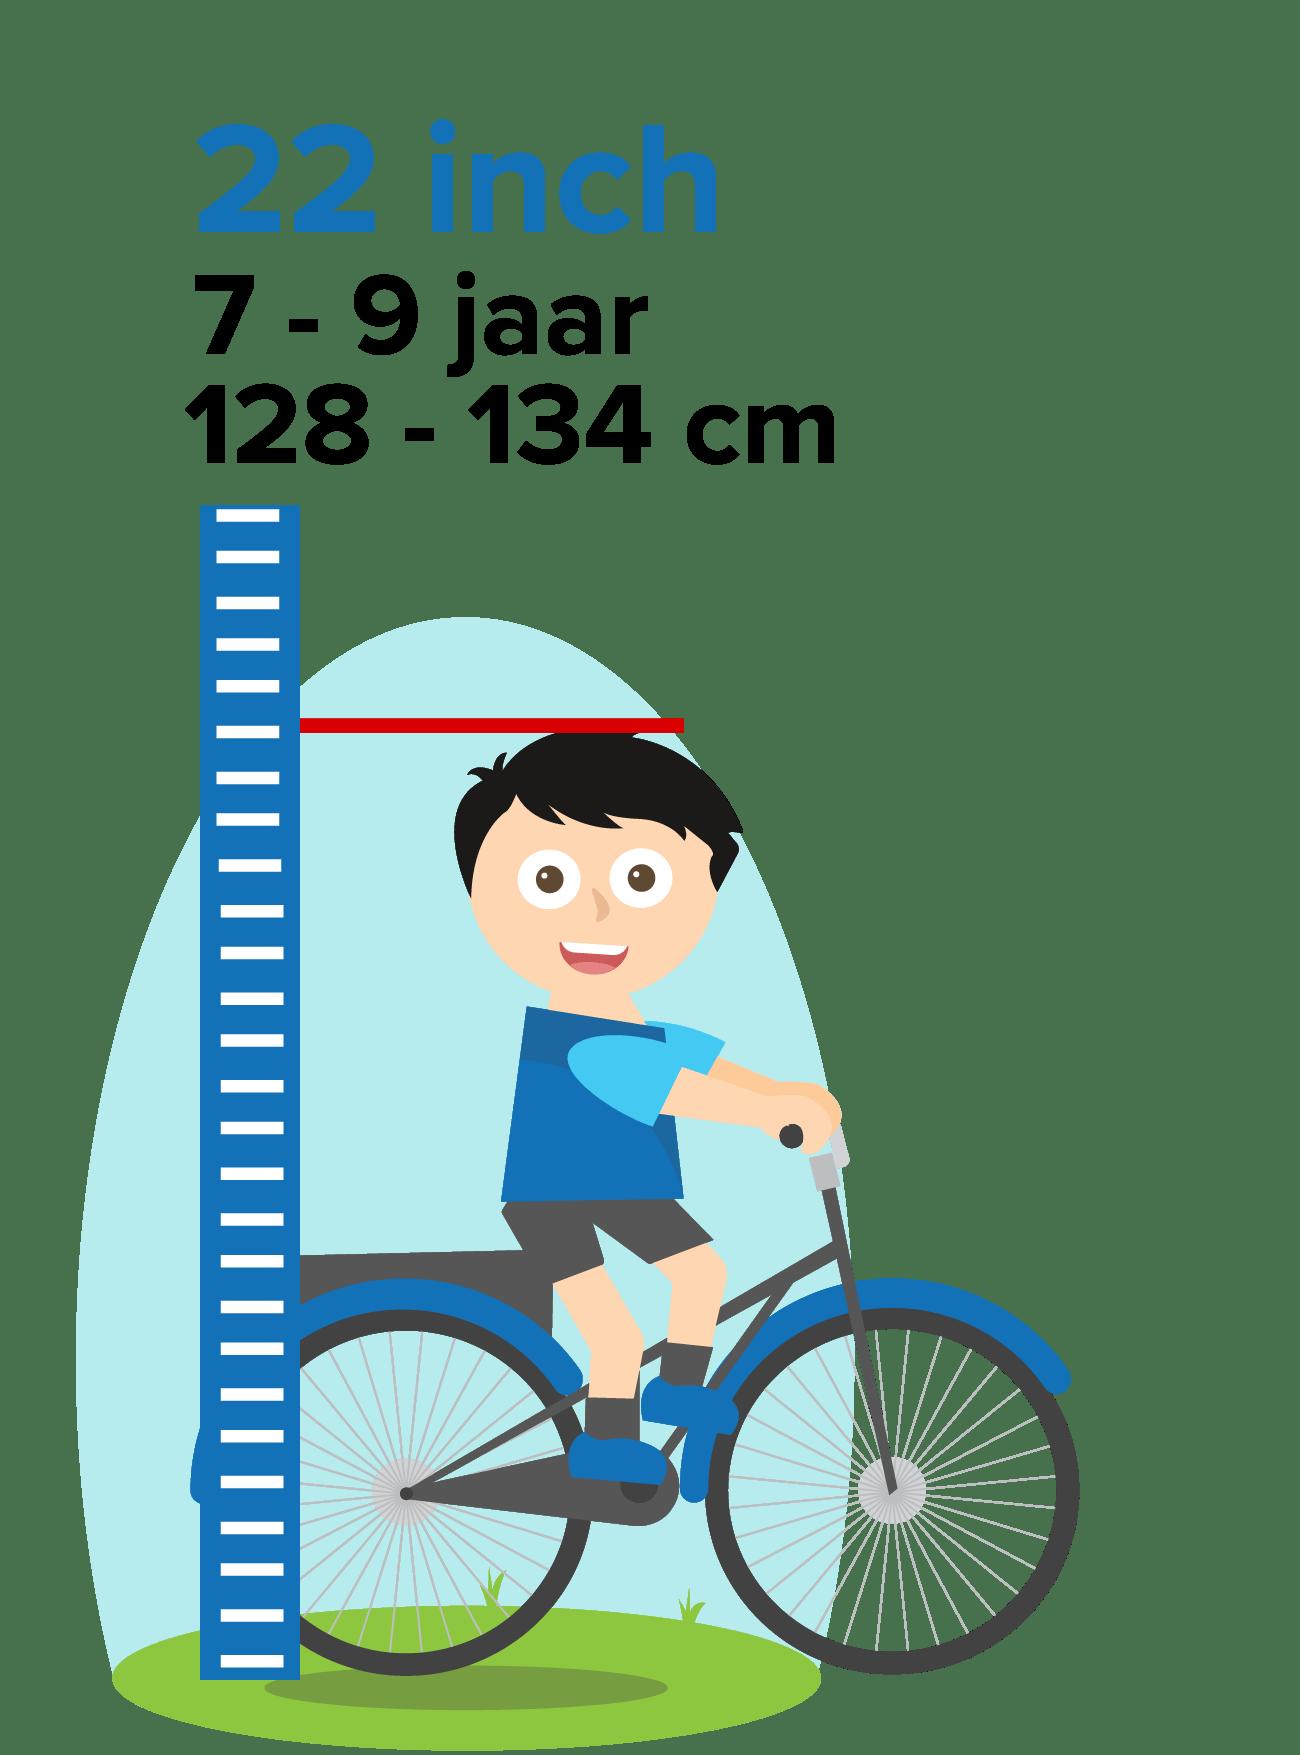 kinderfiets 22 inch